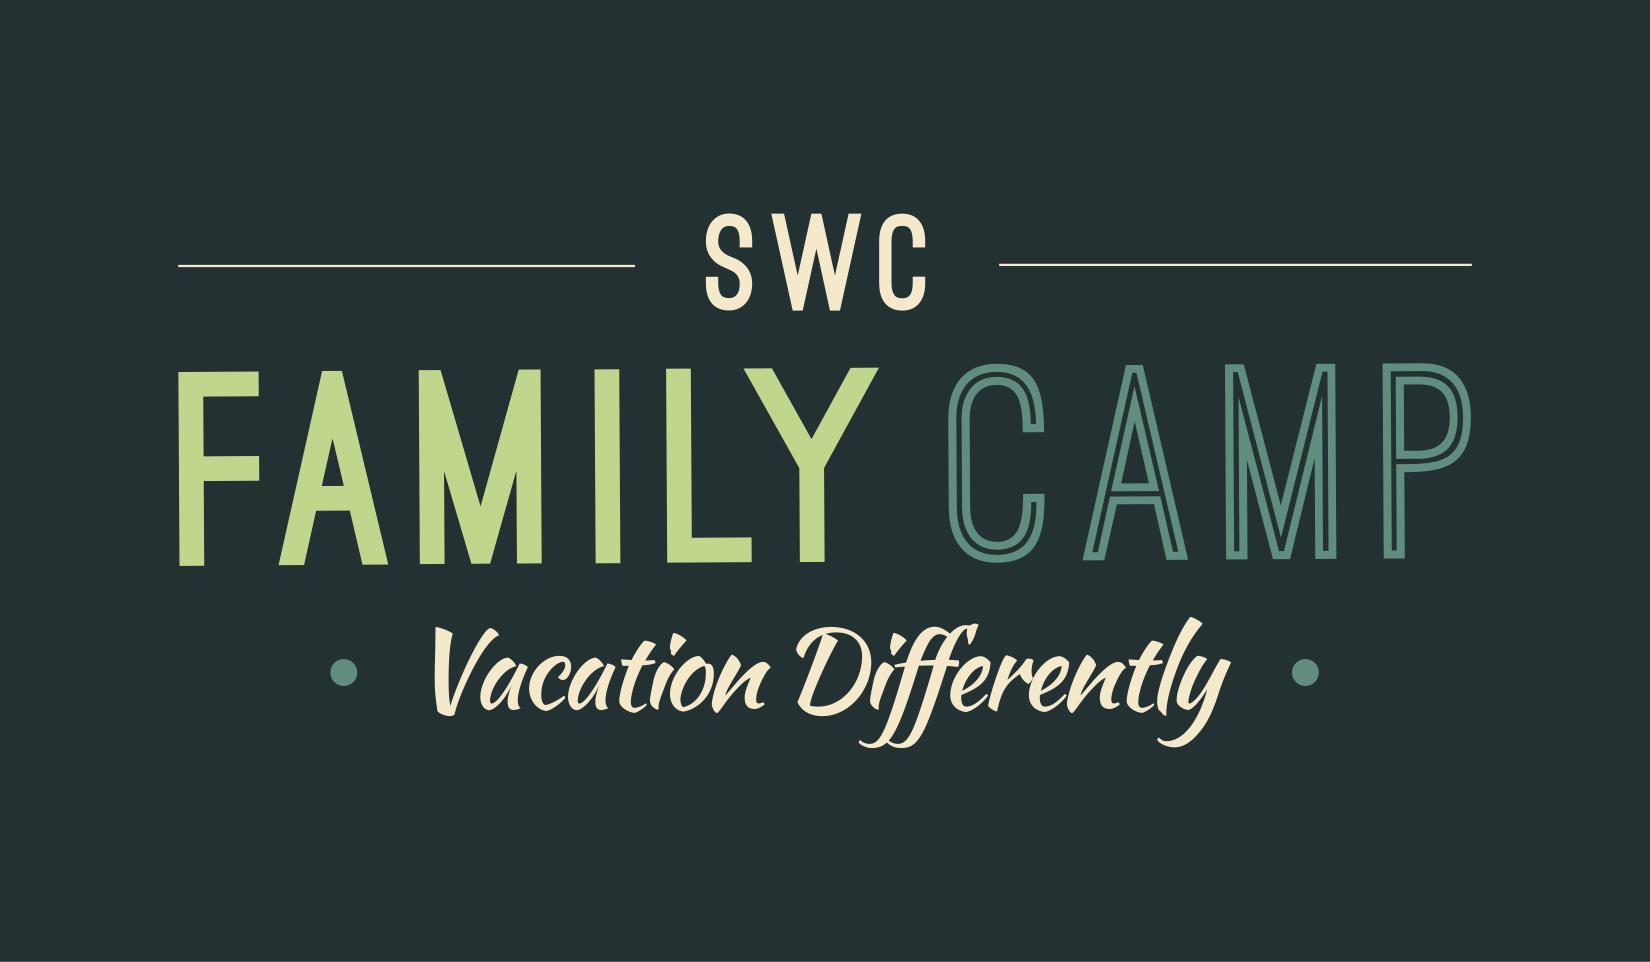 Swcfamilycamp logo 01